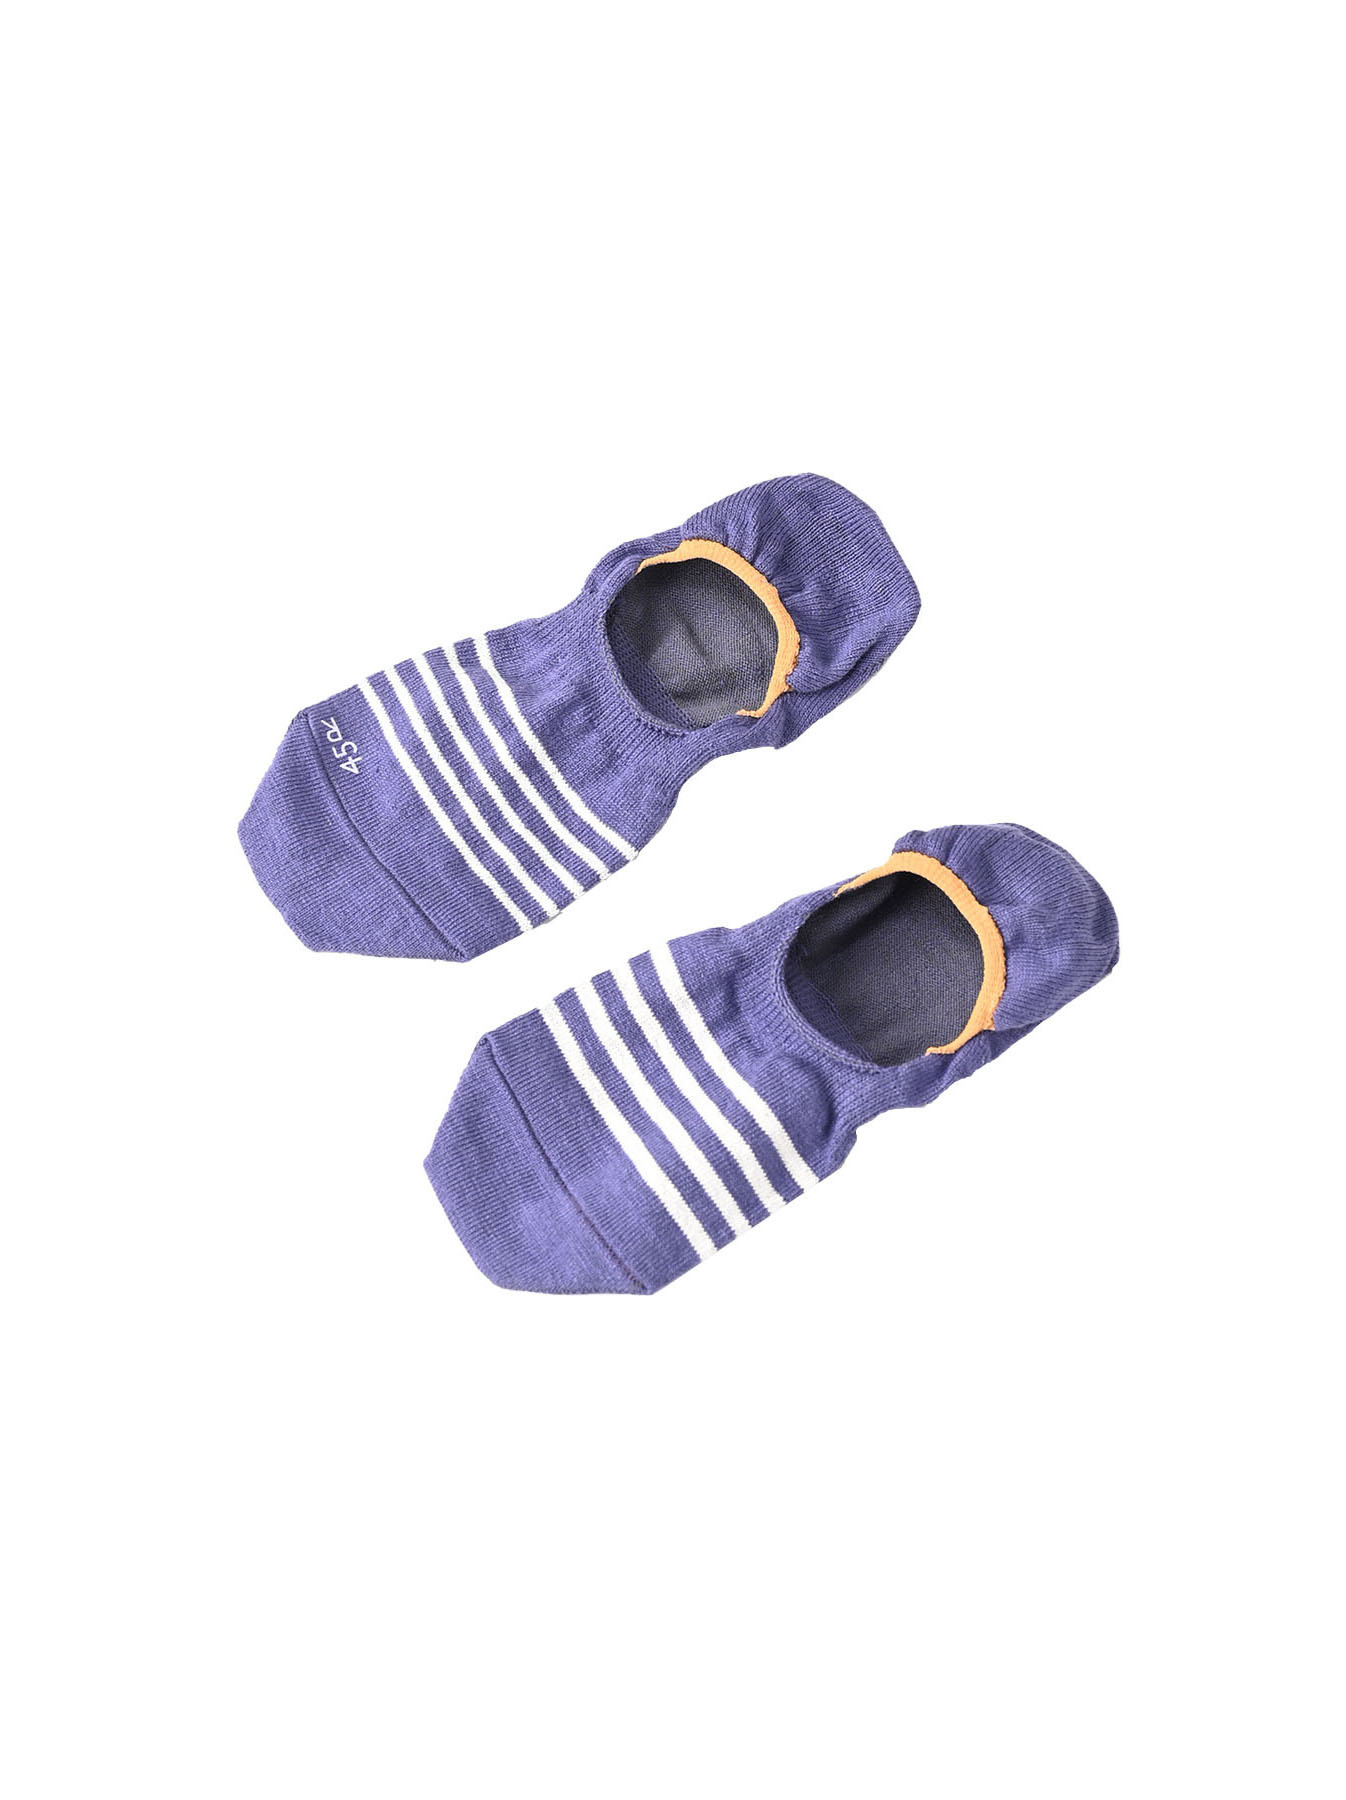 Basque Border Sole Socks (0321)-1